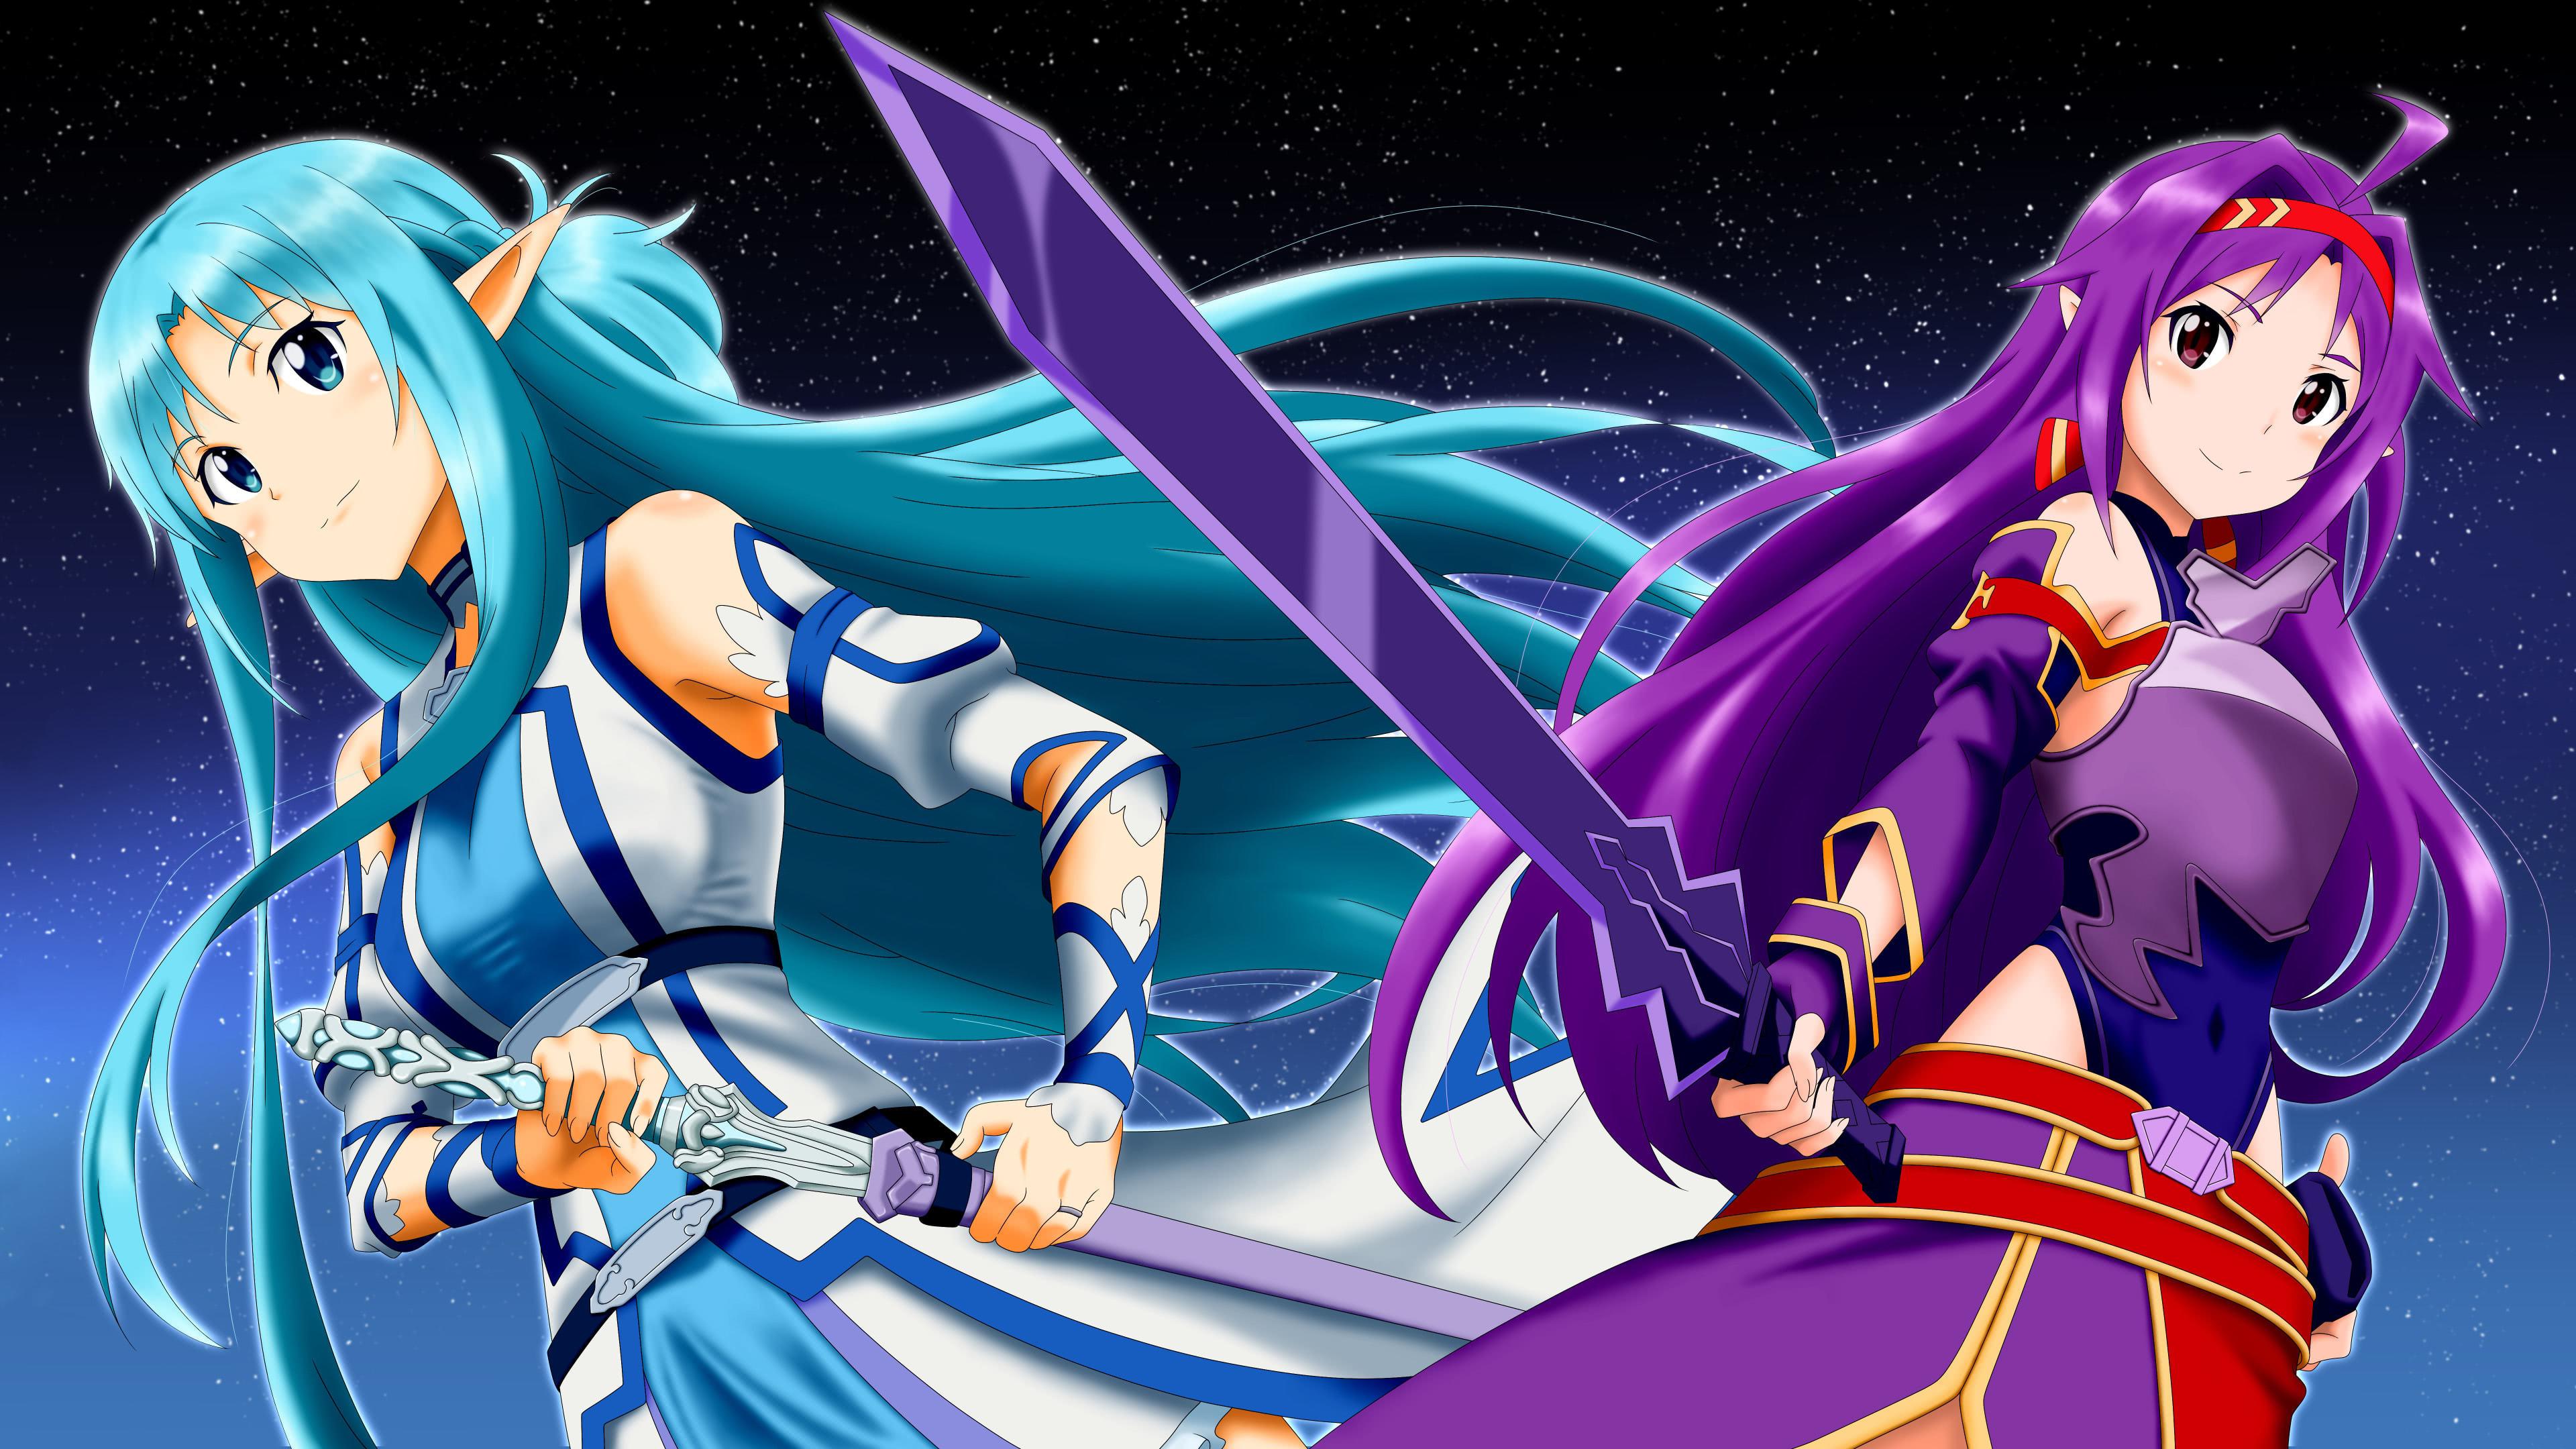 Sword Art Online Asuna And Yuuki Uhd 4k Wallpaper Pixelz